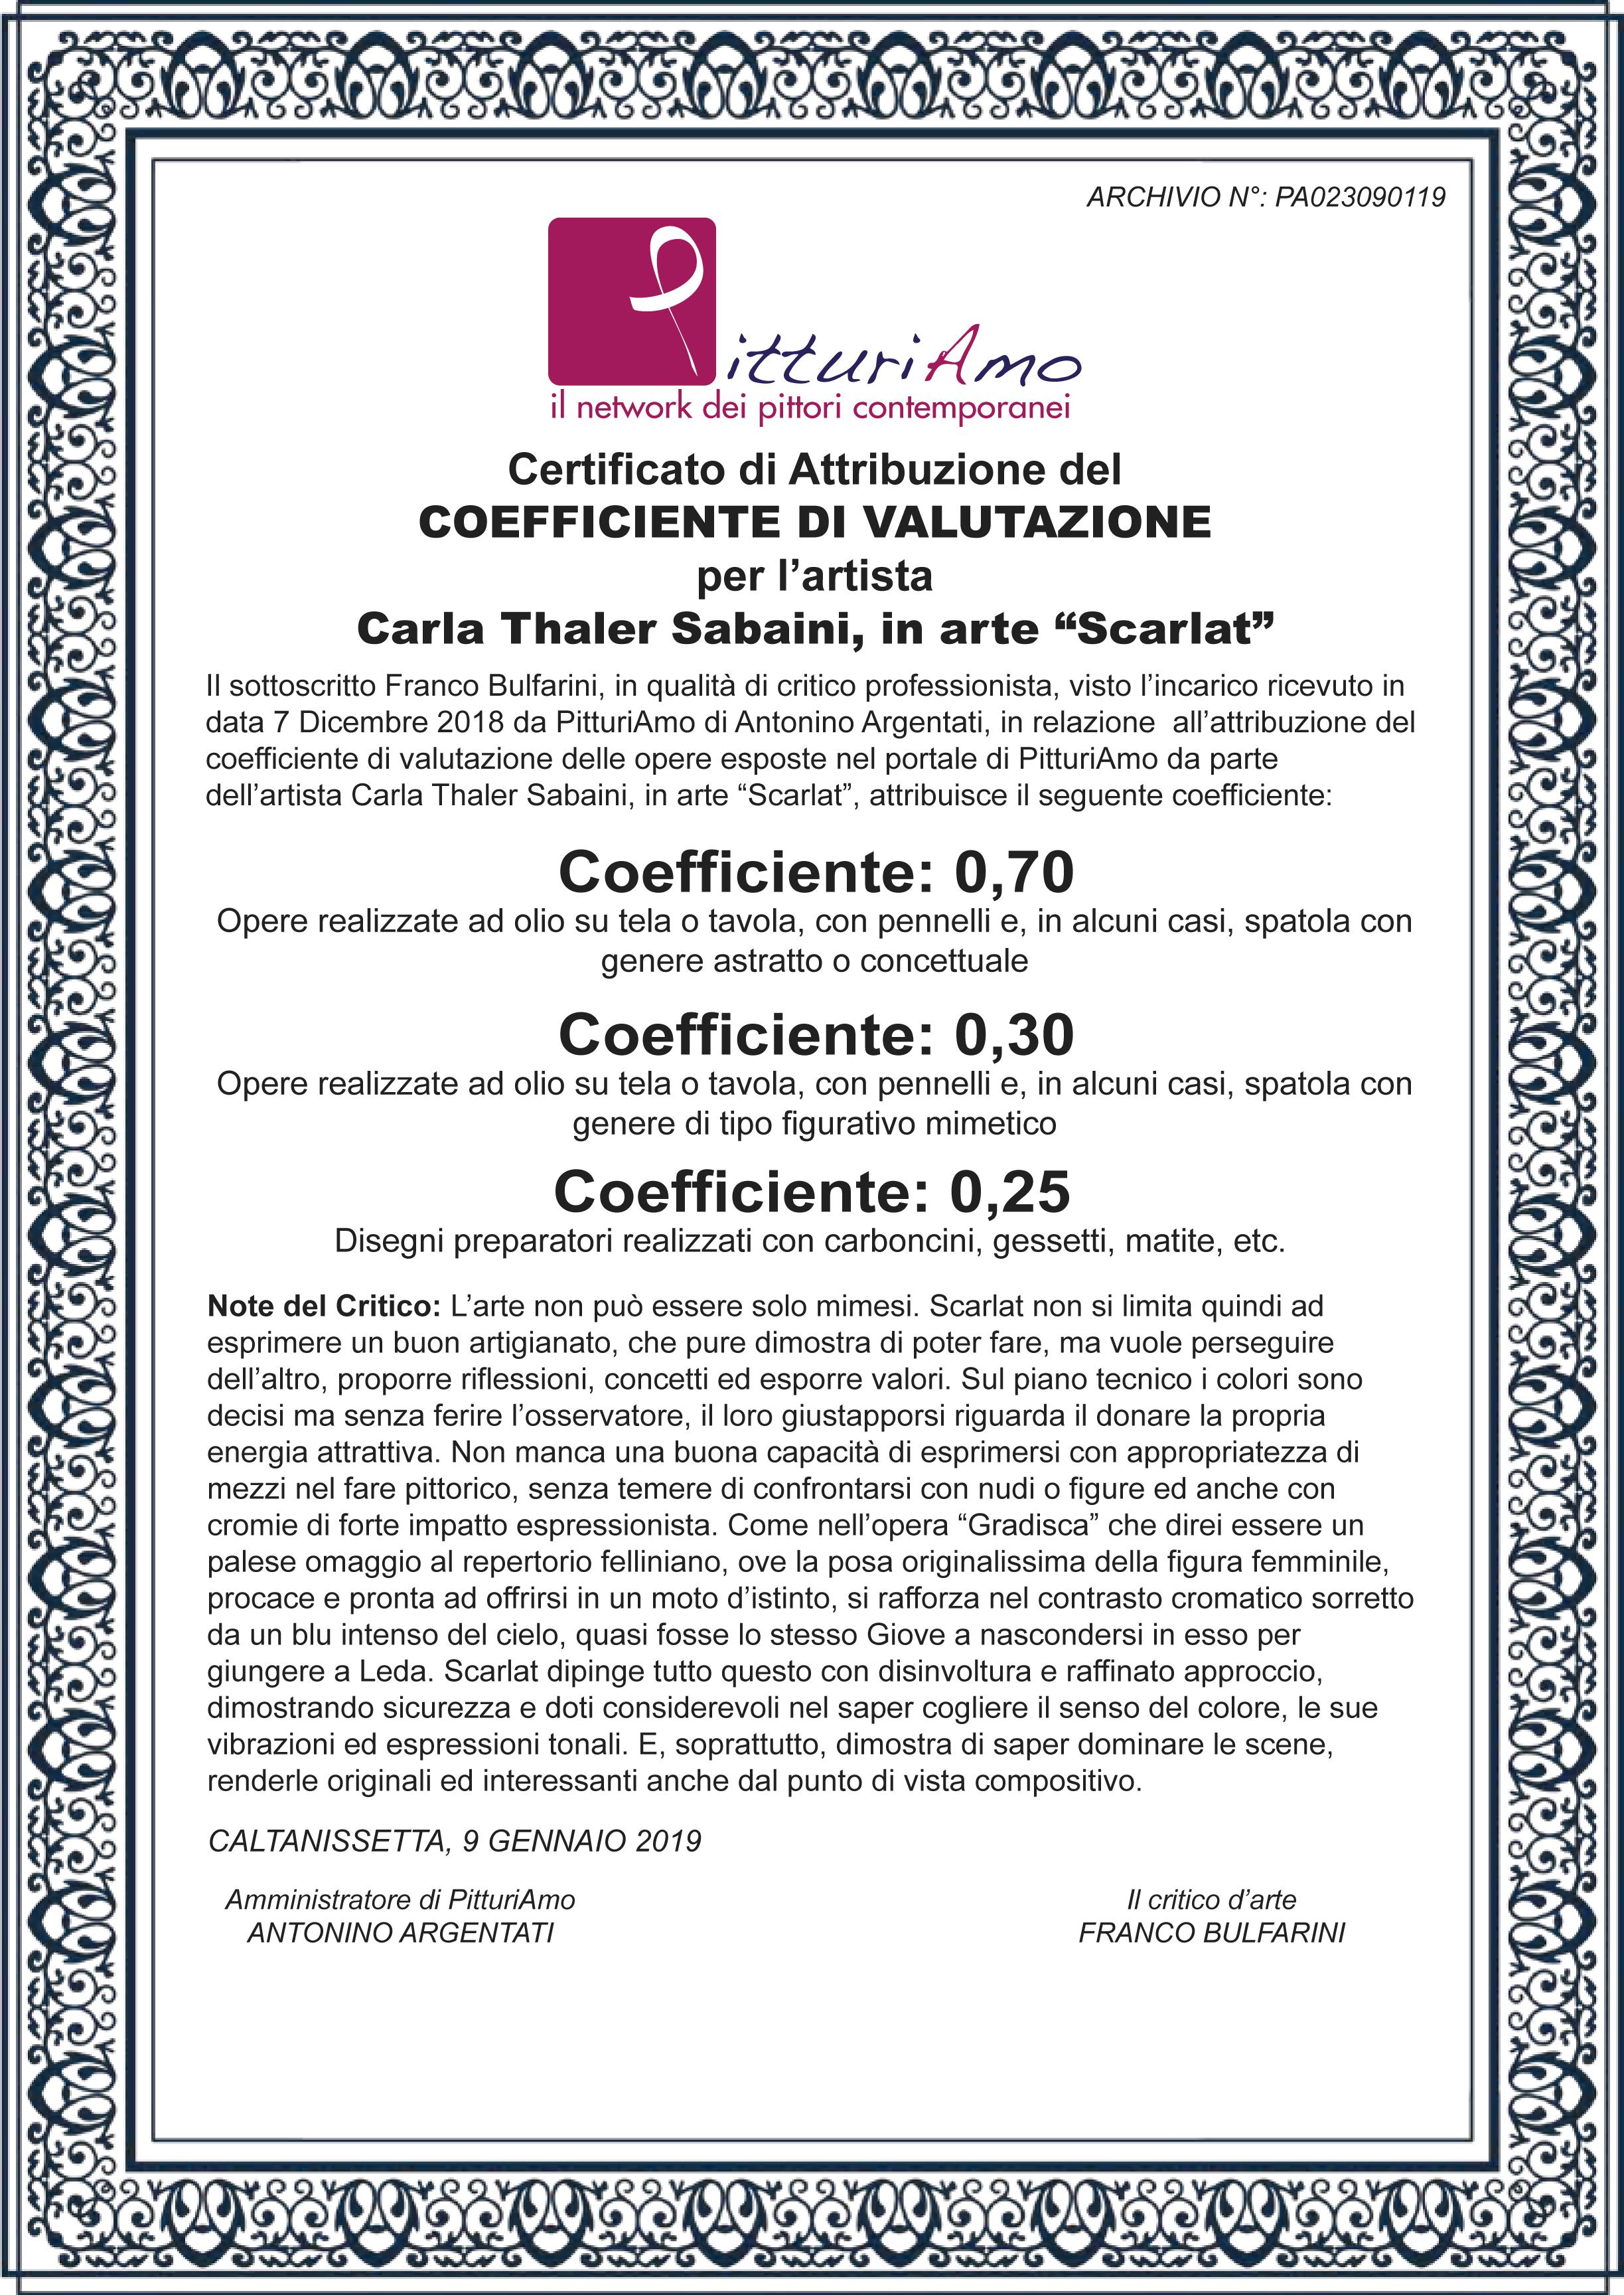 Coefficiente artistico di Carla Thaler, in arte Scarlat